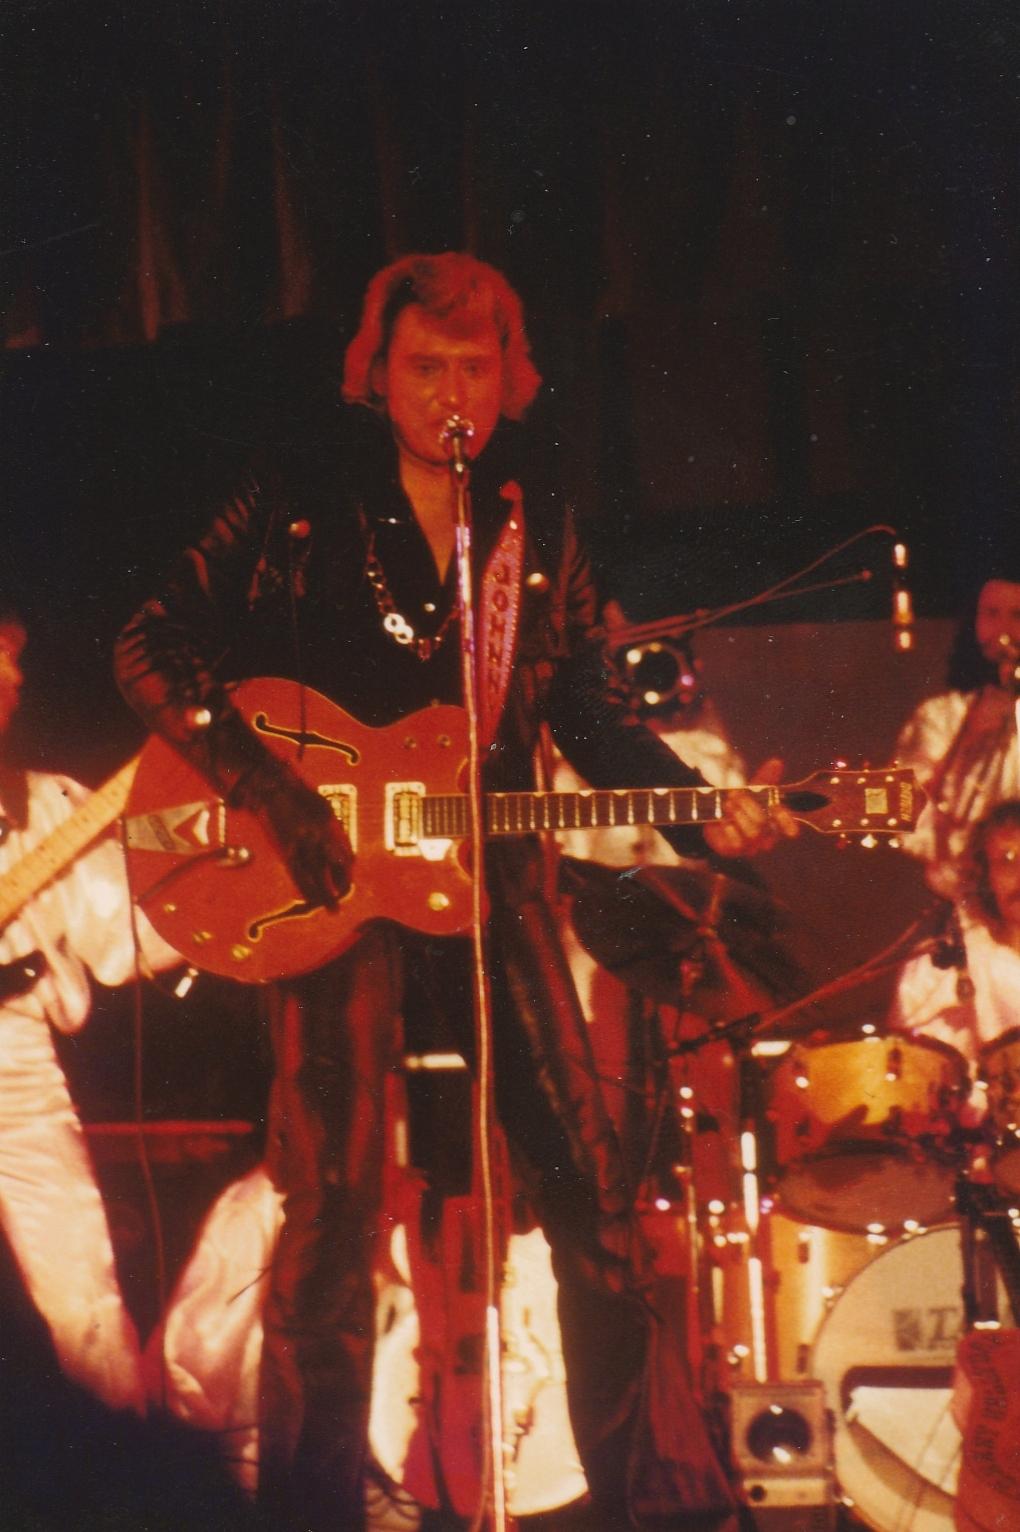 INÉDIT  :  JOHNNY HALLYDAY EN TOURNEE - HIVER 1978 -1979 ( PHOTOS INÉDITES )   Img_2639